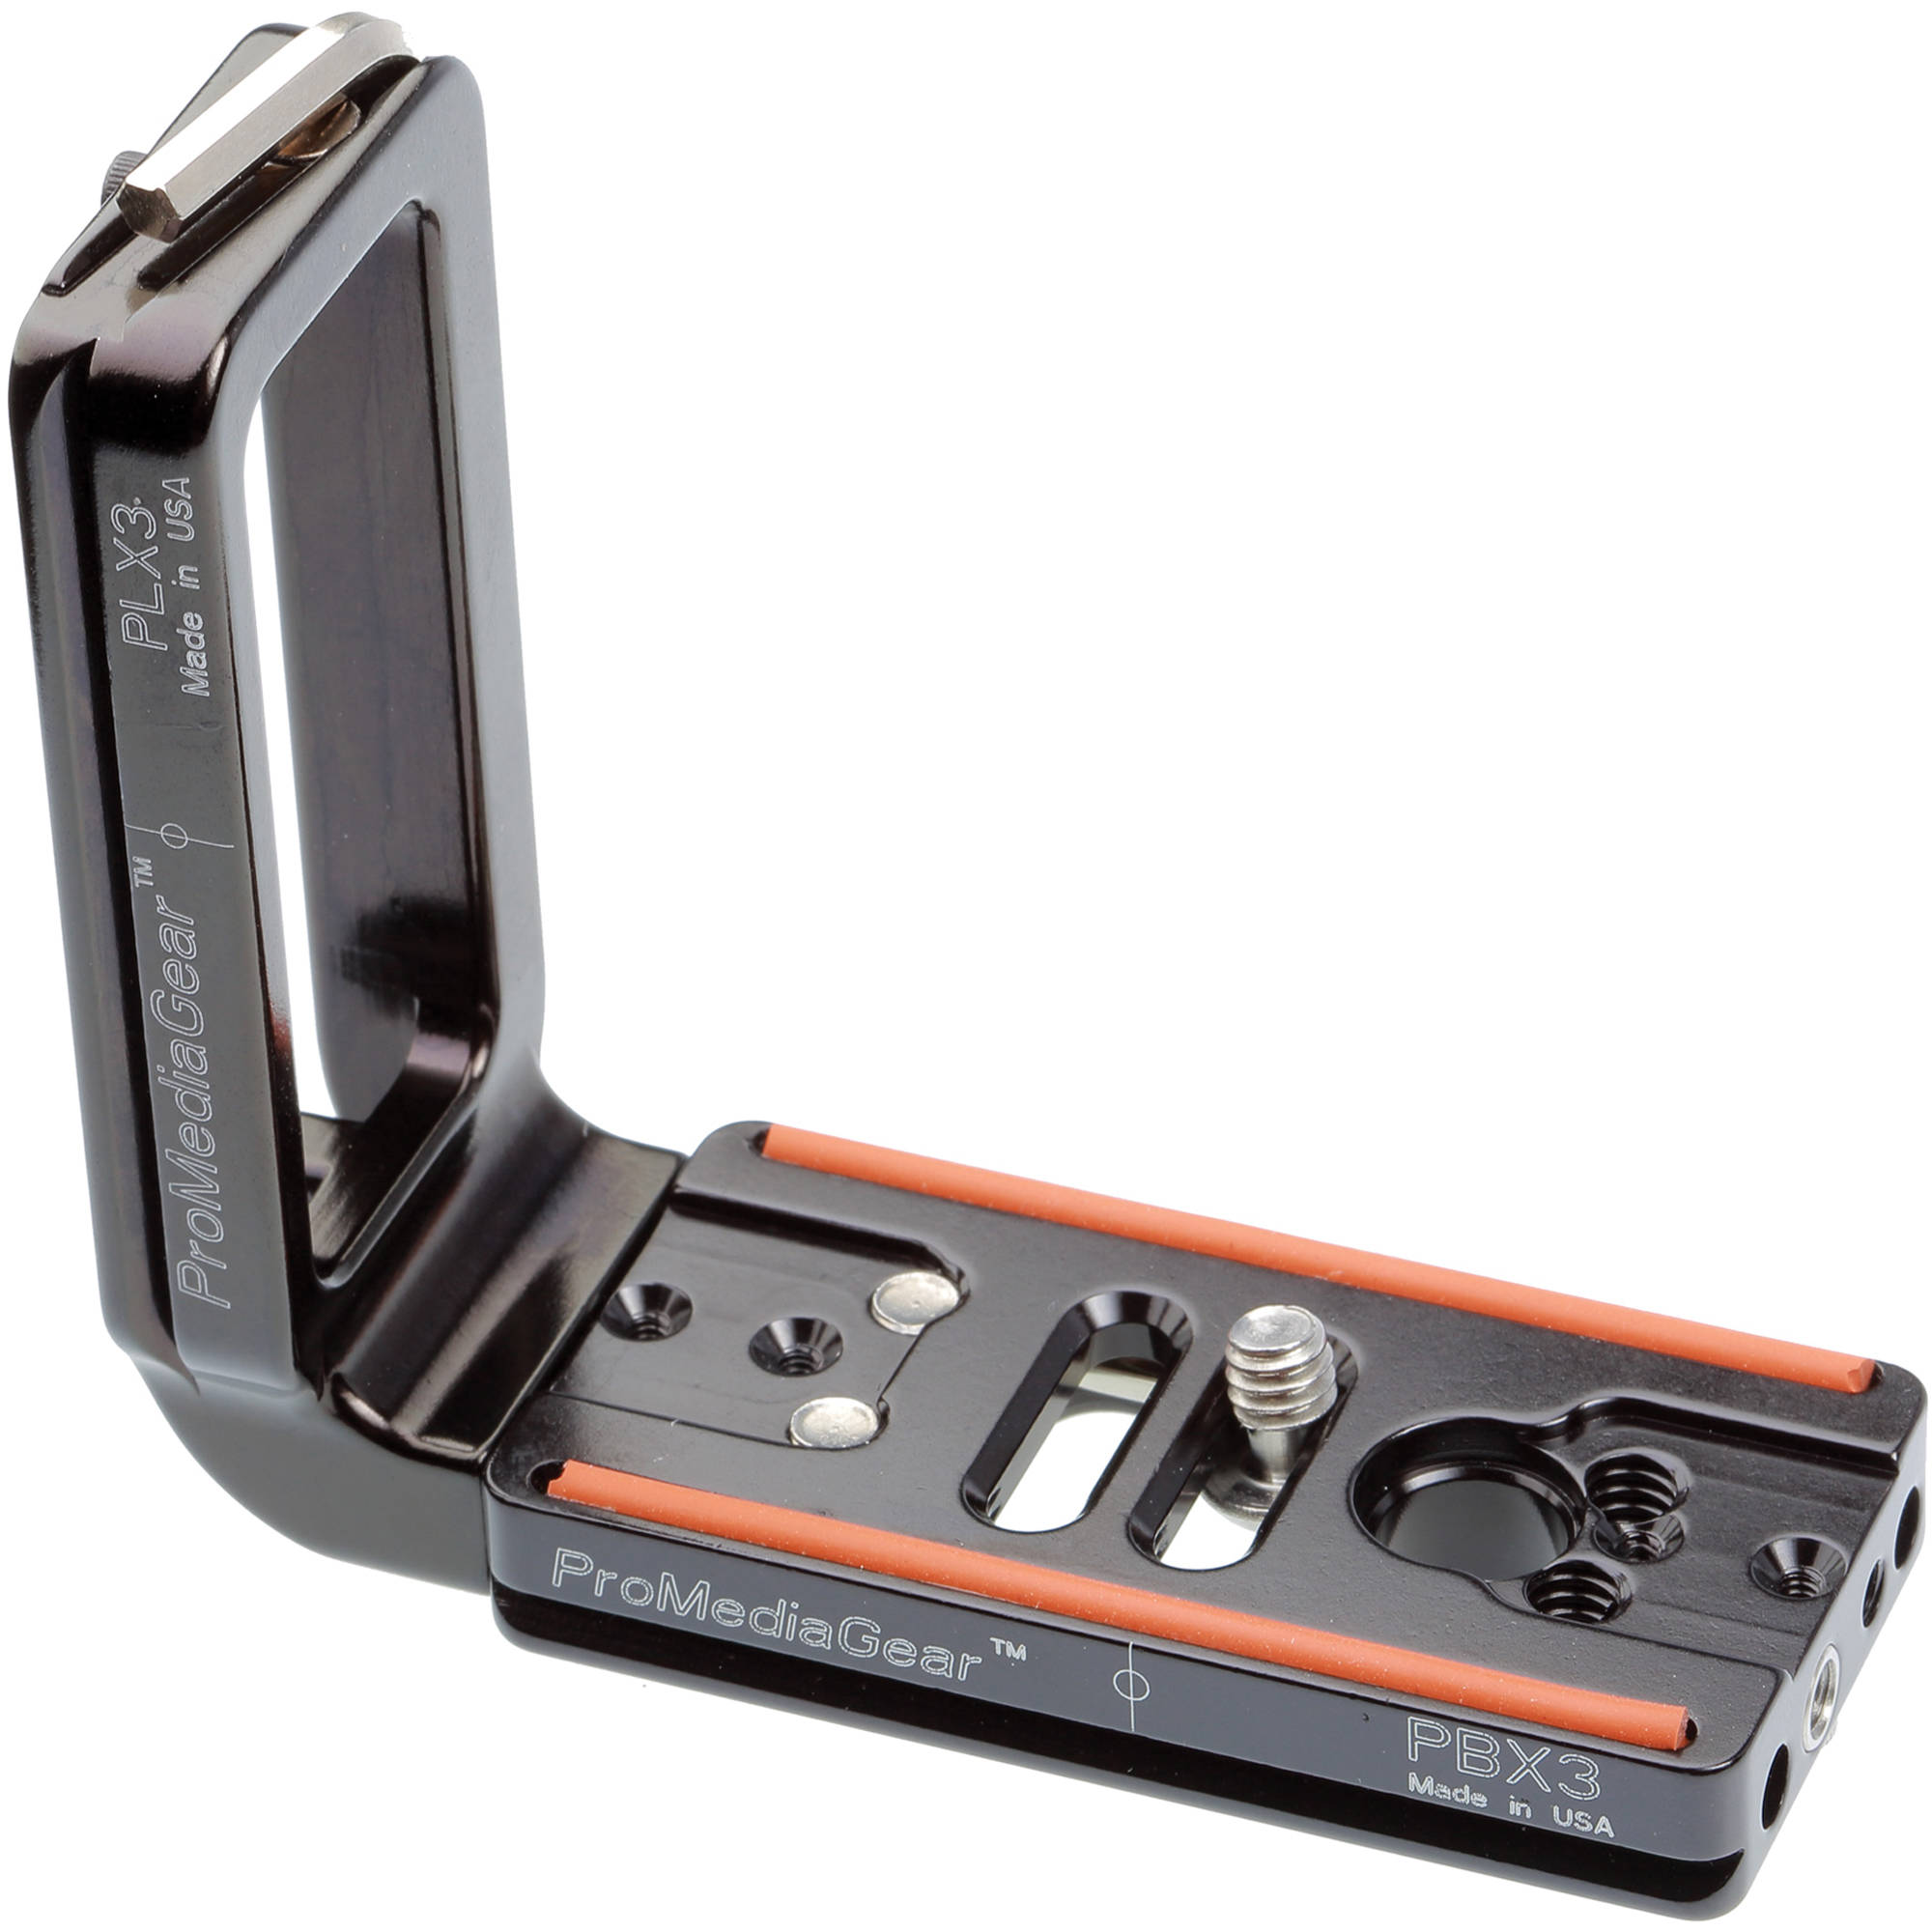 Promediagear Universal L Bracket 3 Plx3x Bh Photo Video Plate Kamera Sony Alpha A6000